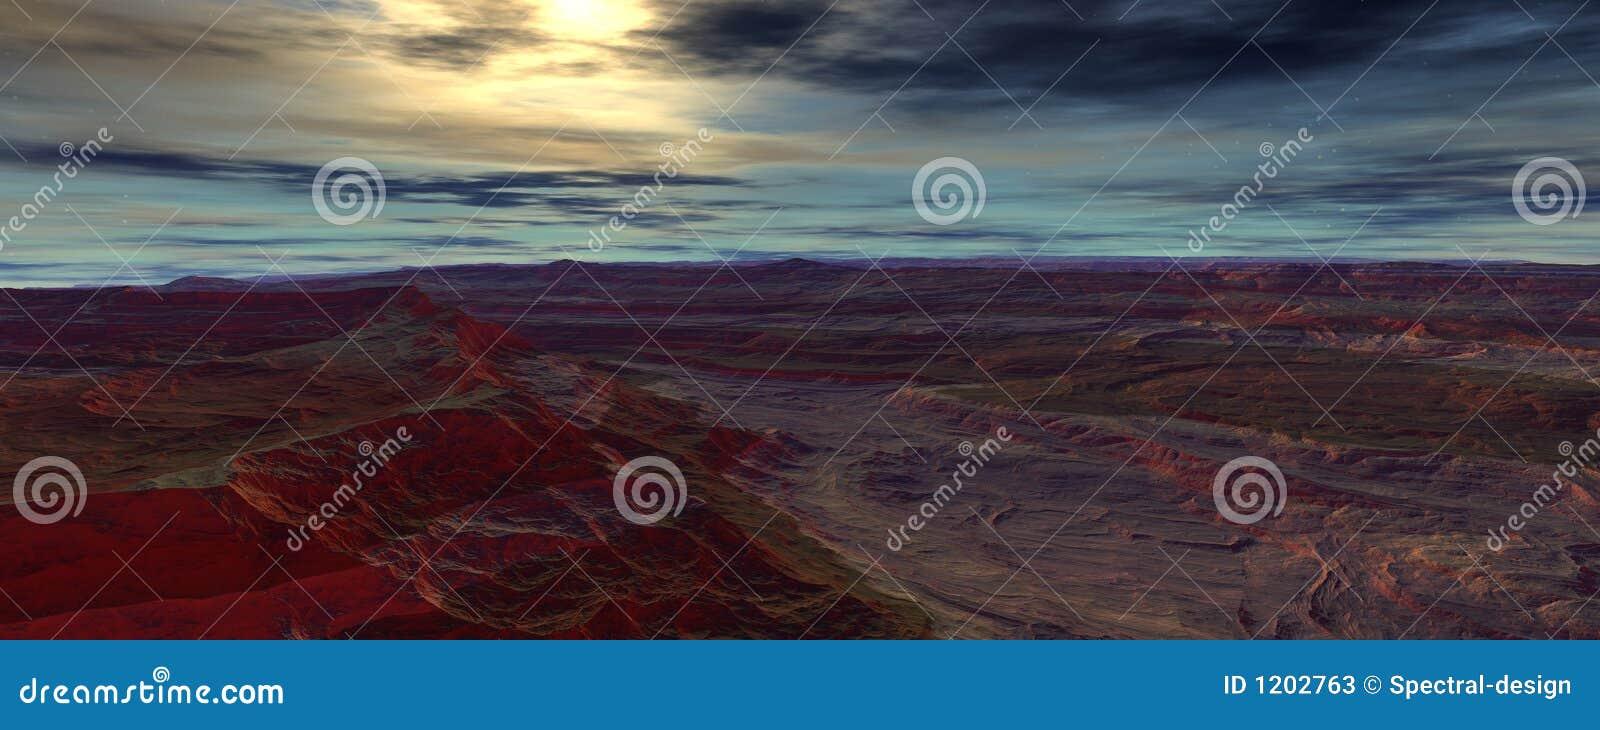 Evening on Centauri